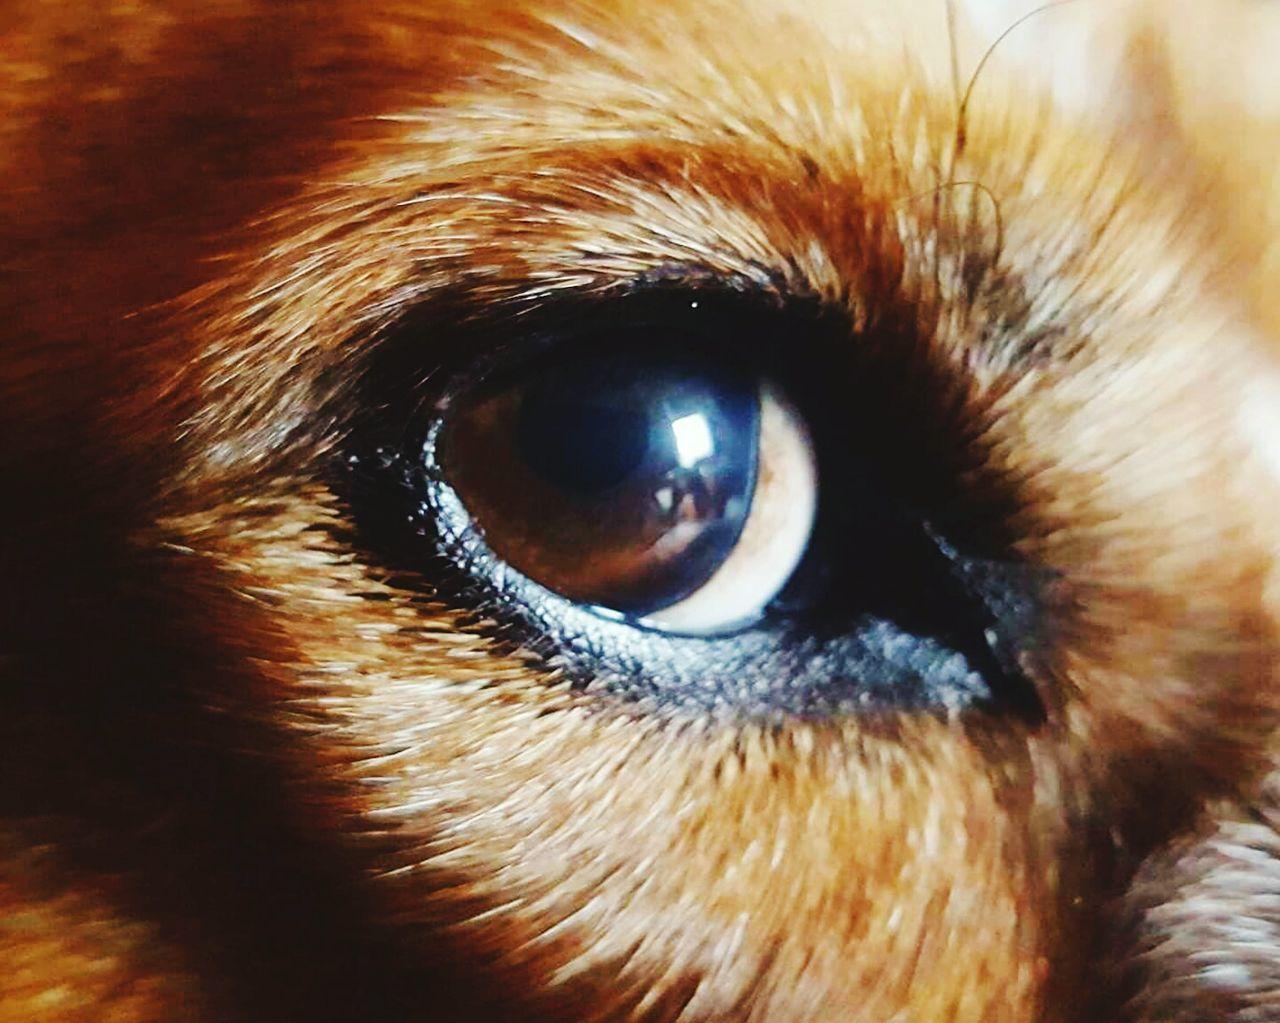 one animal, animal themes, close-up, pets, no people, domestic animals, mammal, animals in the wild, portrait, outdoors, eyeball, day, eyesight, nature, bird of prey